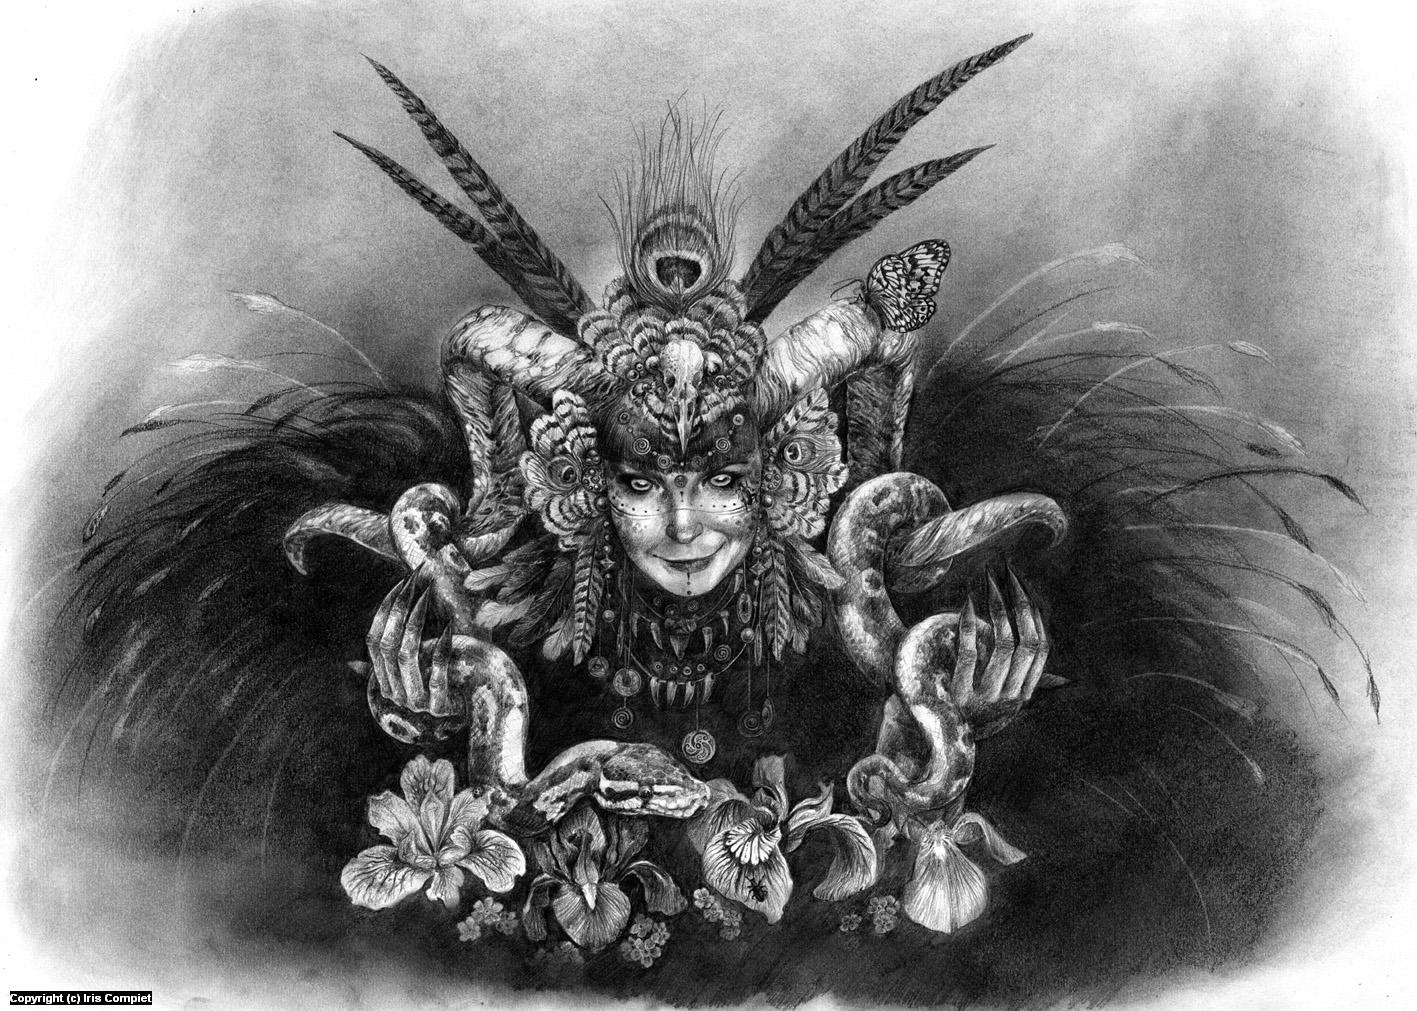 Aries Artwork by iris compiet